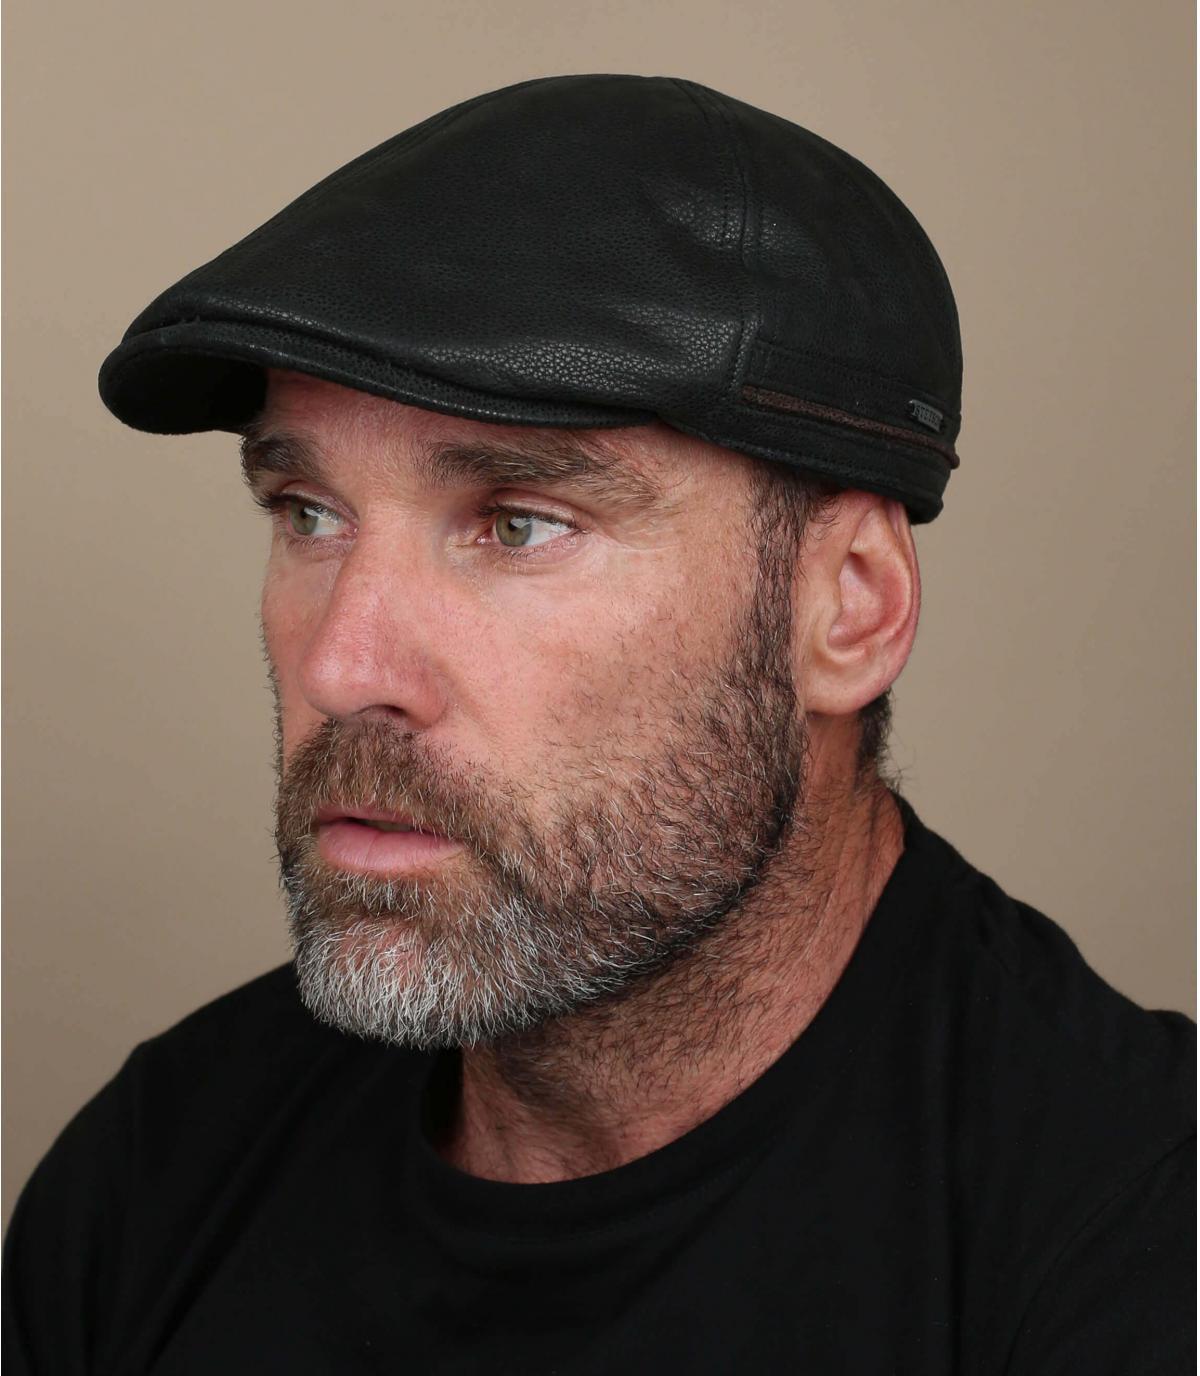 Flache Cap Stetson schwarz